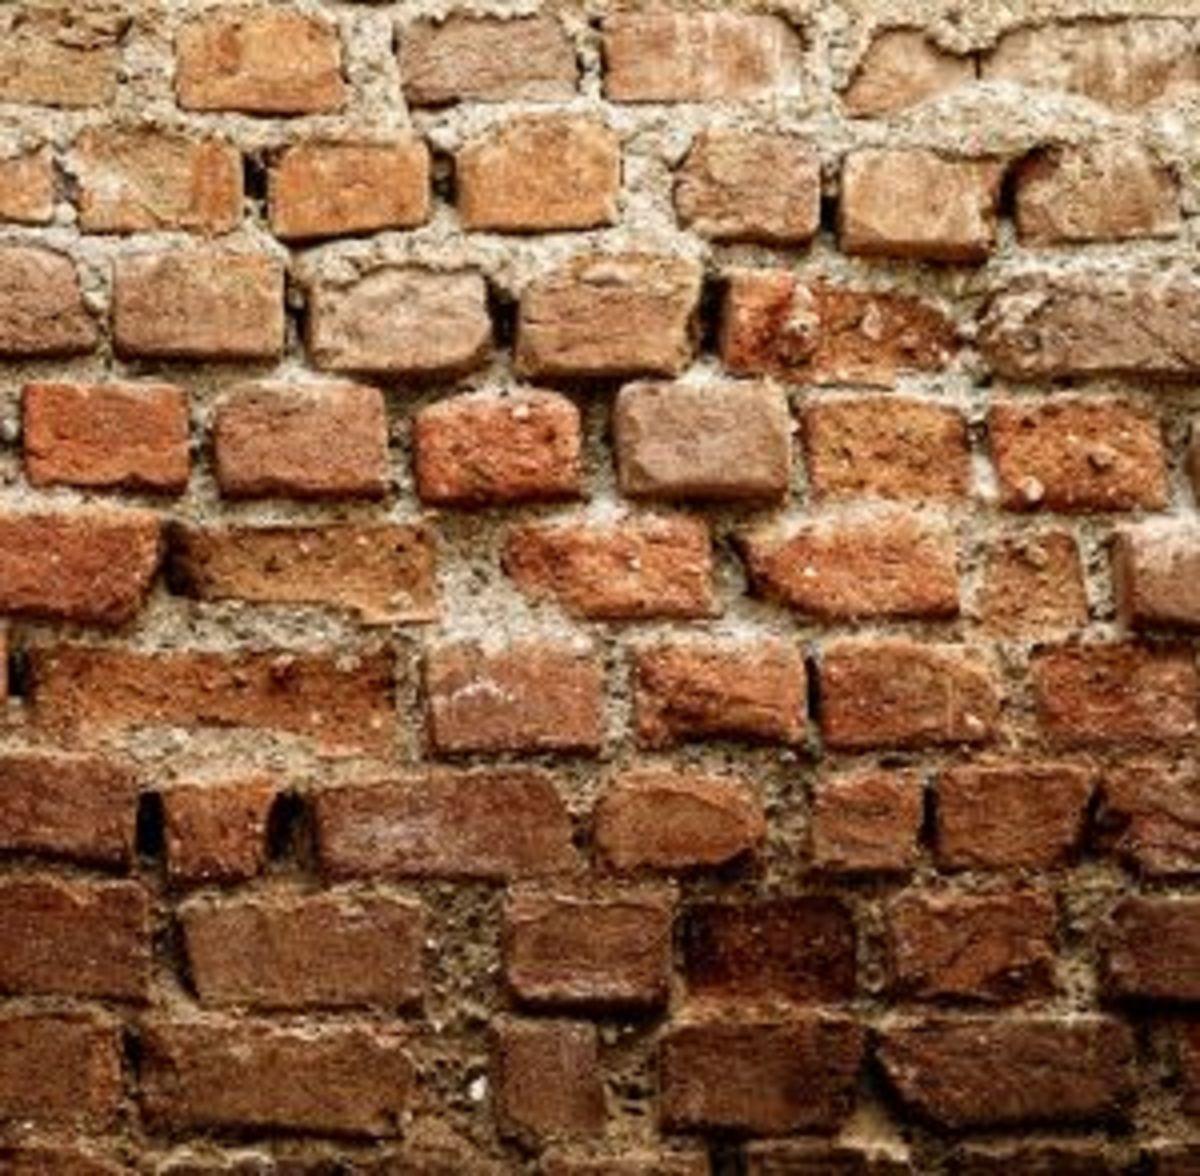 bricks-and-tiles